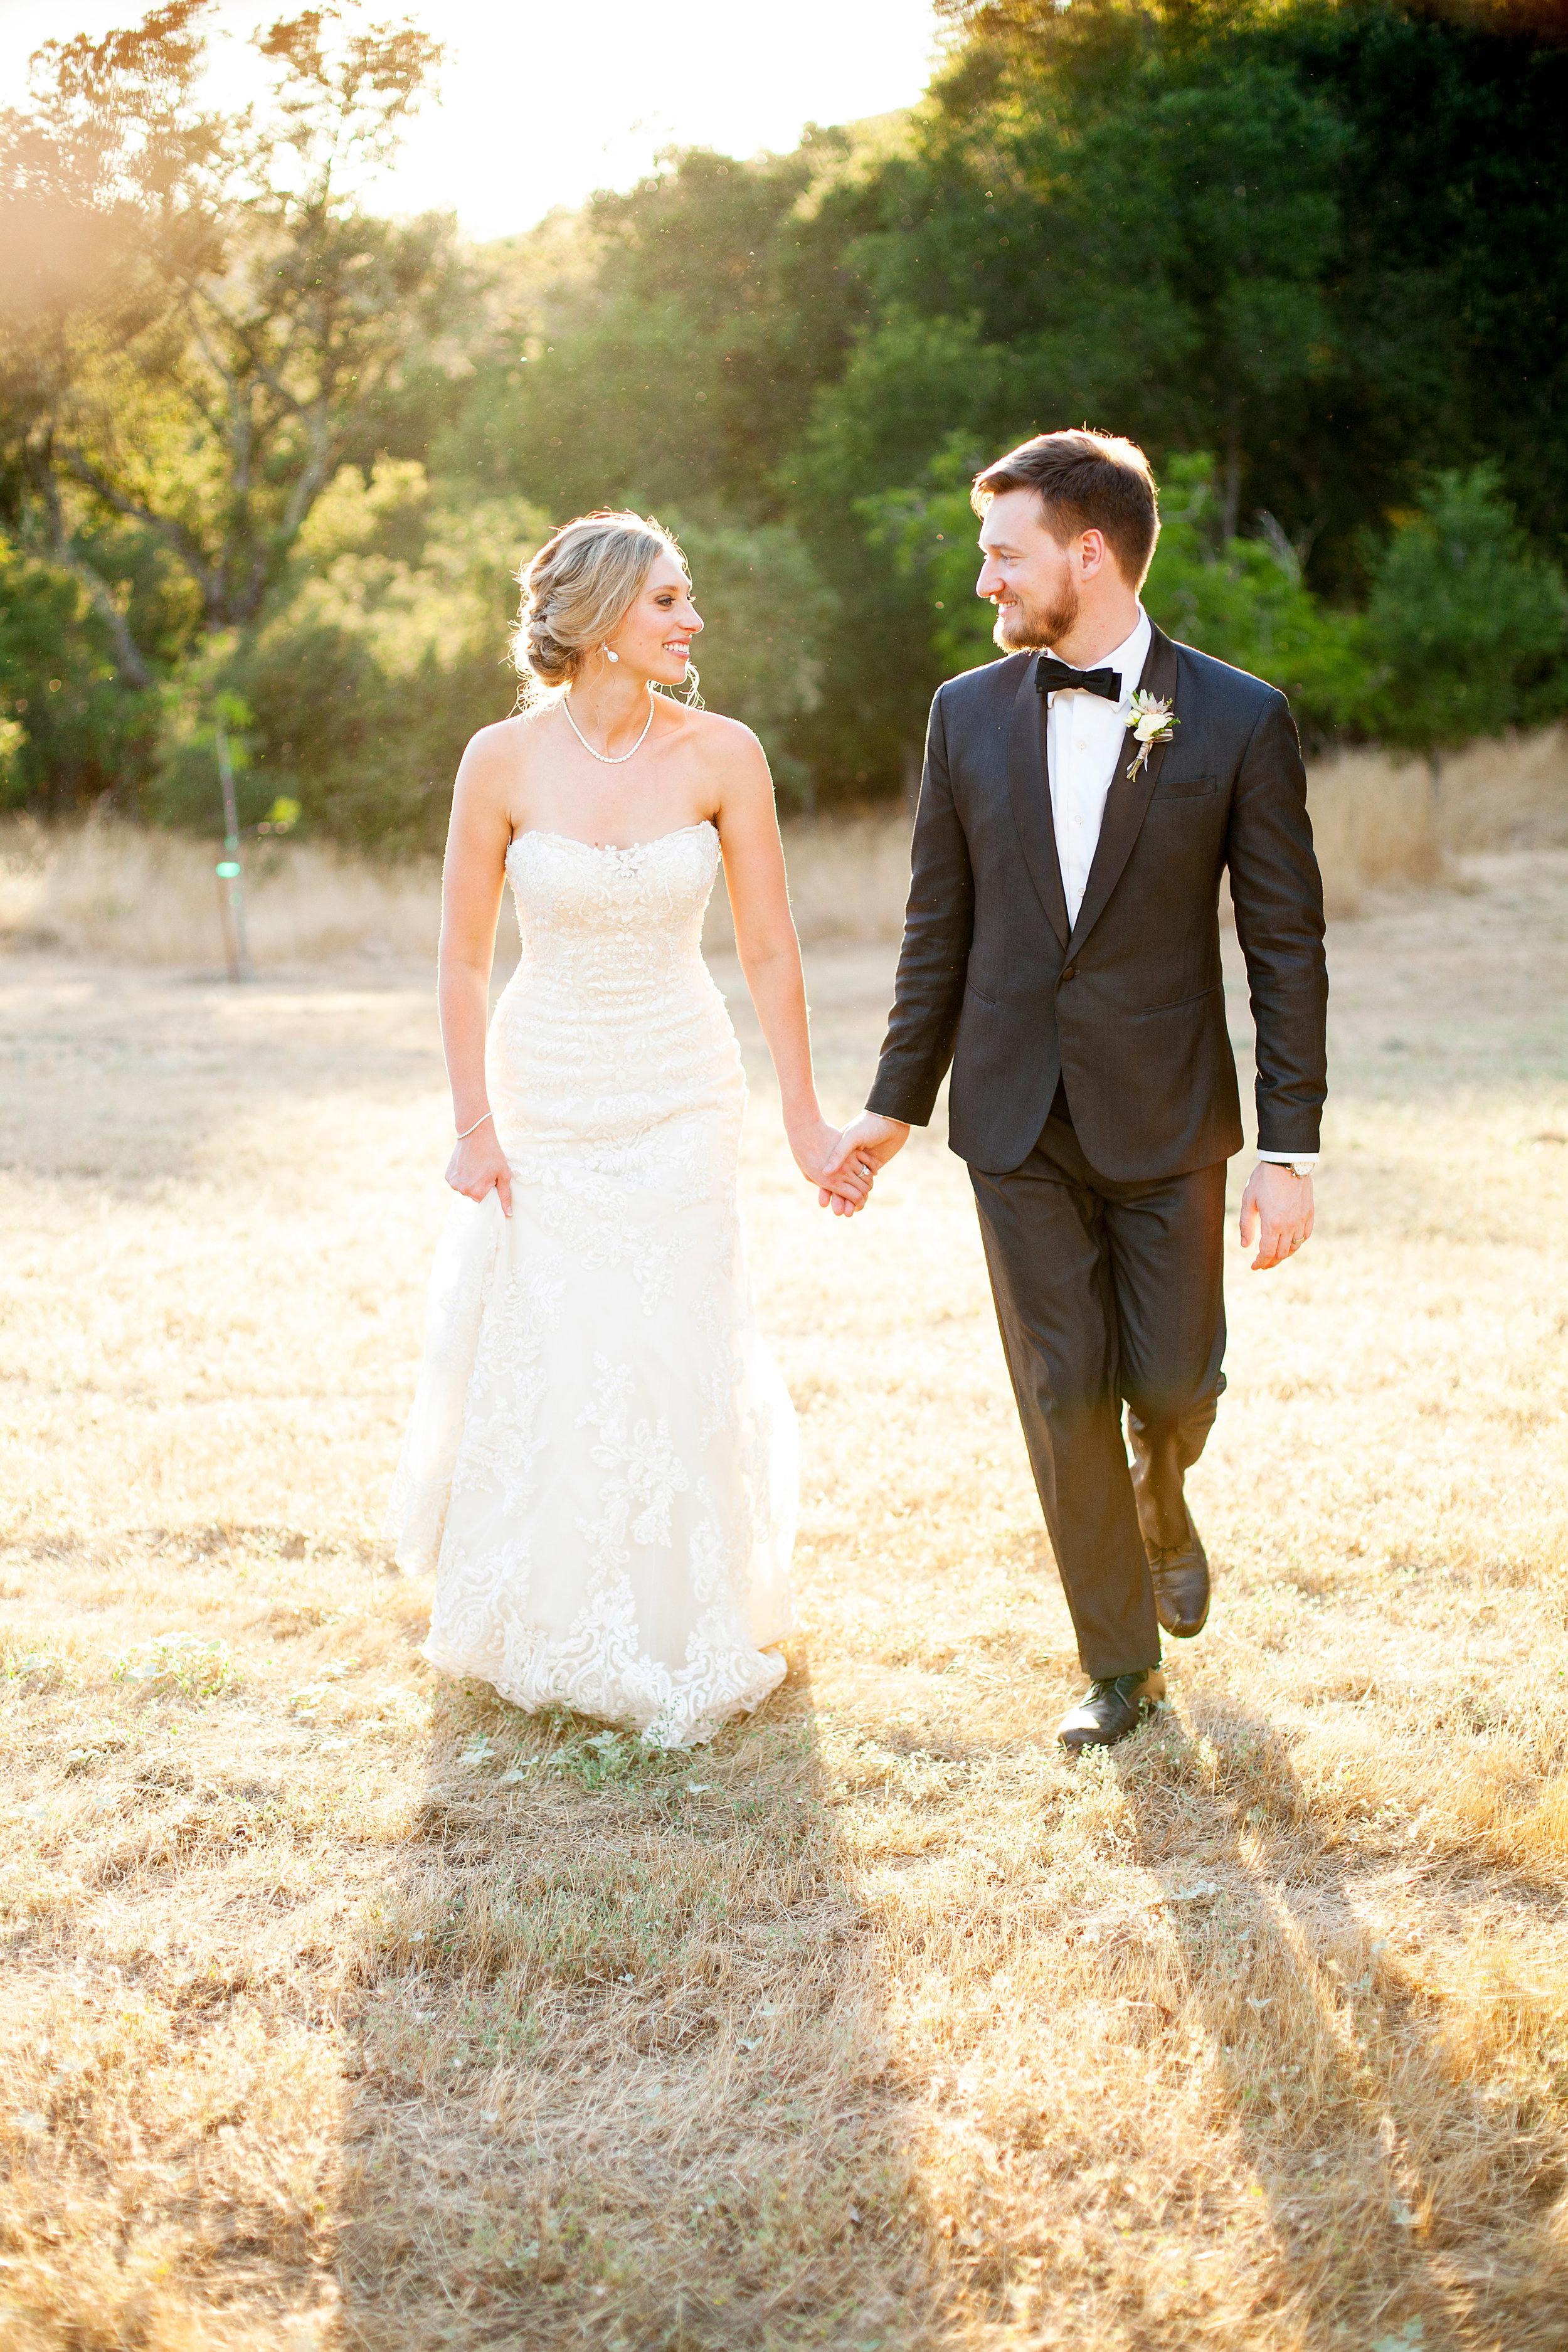 Best-Napa-Valley-Wedding-Venues-Triple-S-Calistoga.jpg